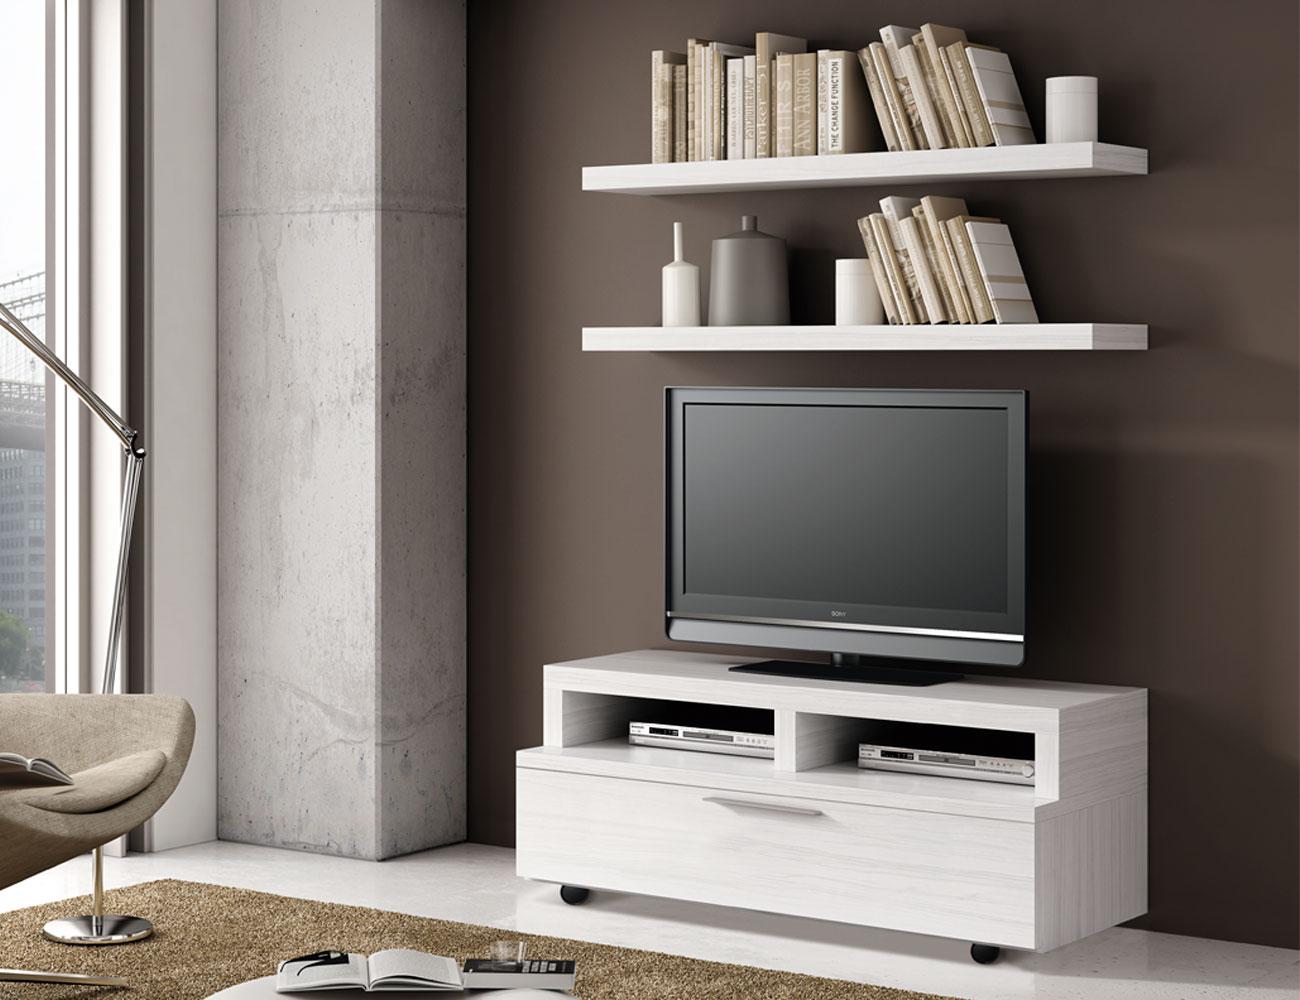 725 mueble tv albian